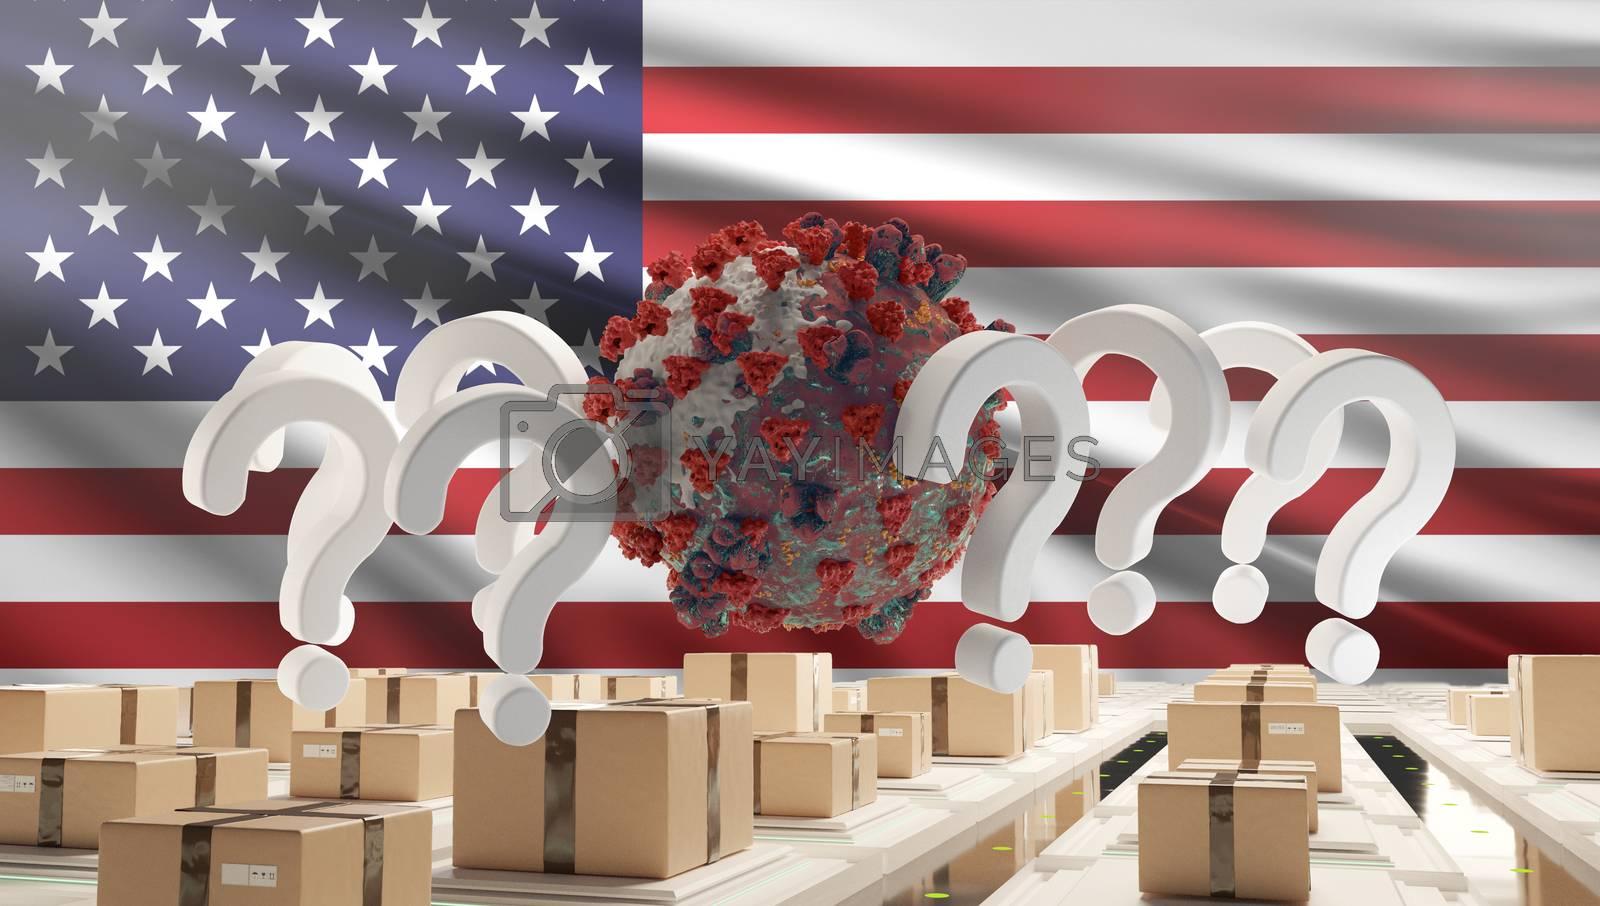 flag of USA question marks Coronavirus Covid-19 symbolic 3d-illustration